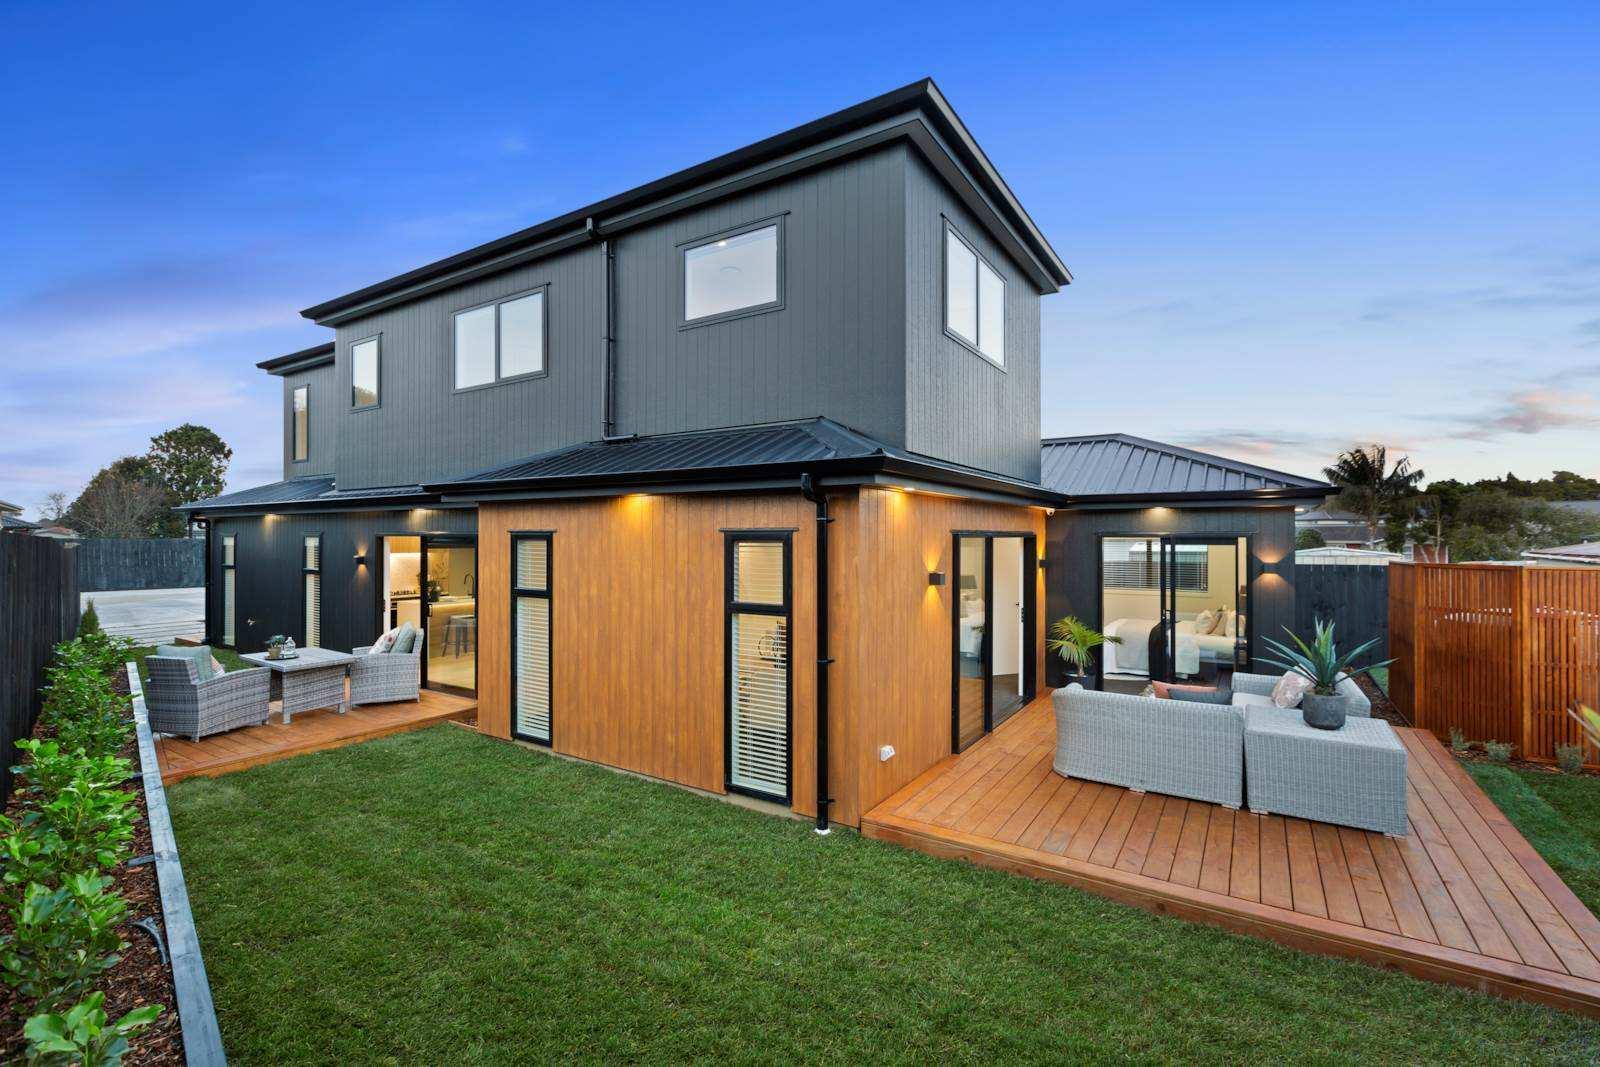 Wattle Downs 6房 全新品质奢居 10年建筑质保 大气舒阔格局 亮点不胜枚举 给您一个完美的家! Brand New Luxury 'High Spec Smart Home'